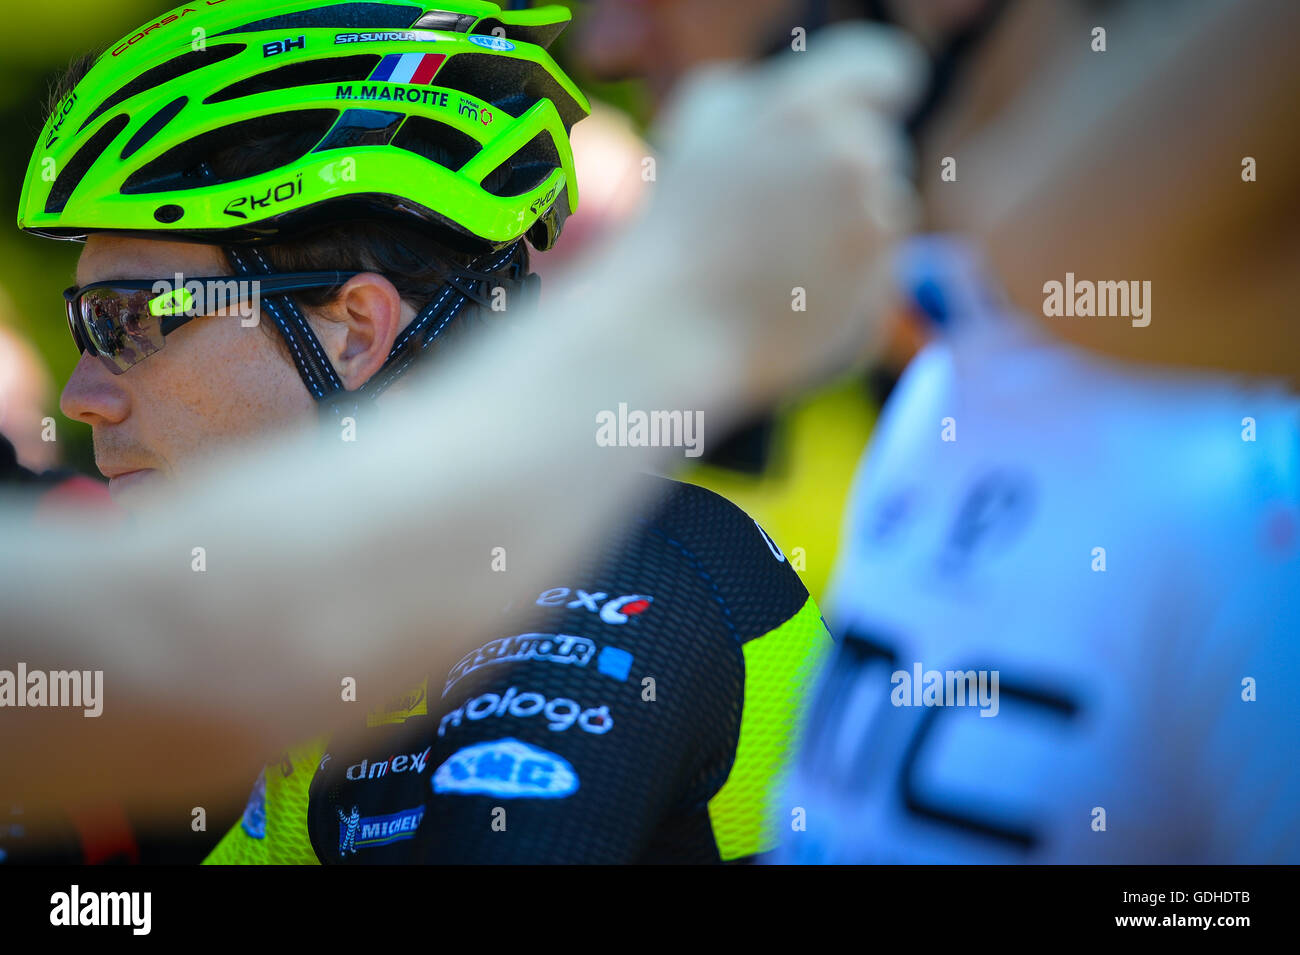 Montgenevre, France. 16th July, 2016. French mountain bike championship 2016. Men starting line CAROD Titouan. Credit: - Stock Image